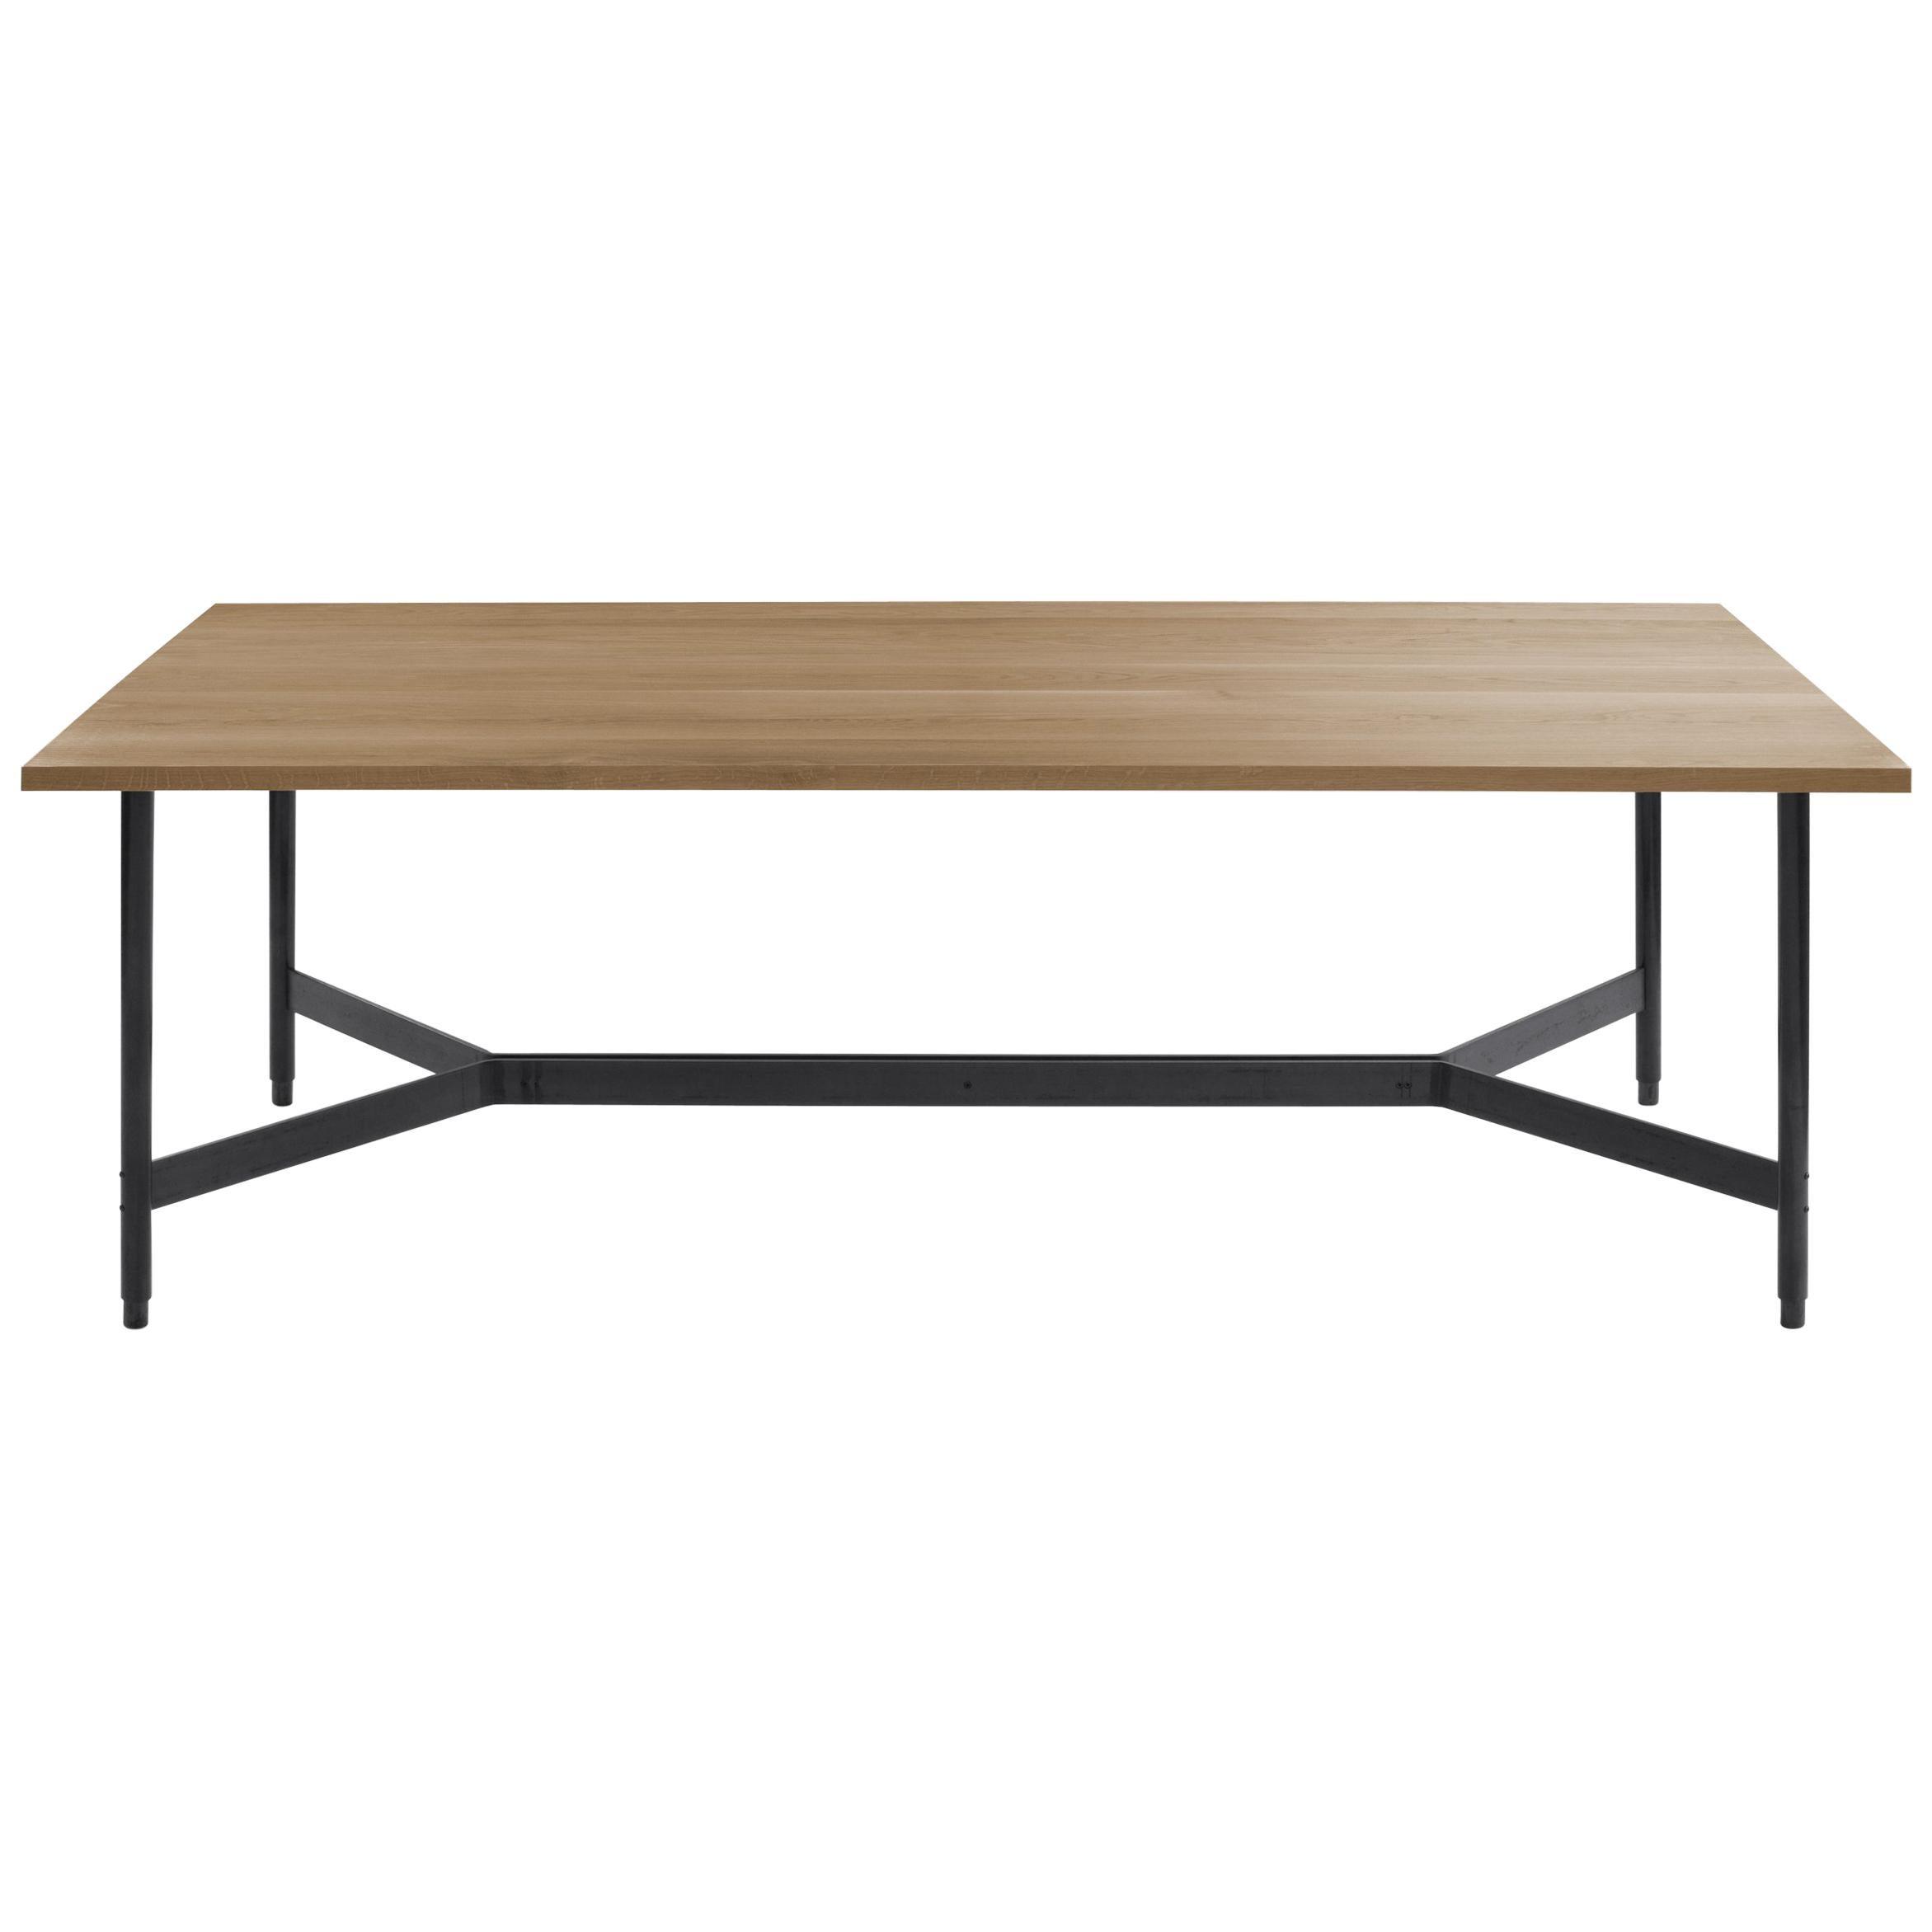 AT11, Handmade Solid White Oak & Blackened Steel Dining Table, Work Table, Desk